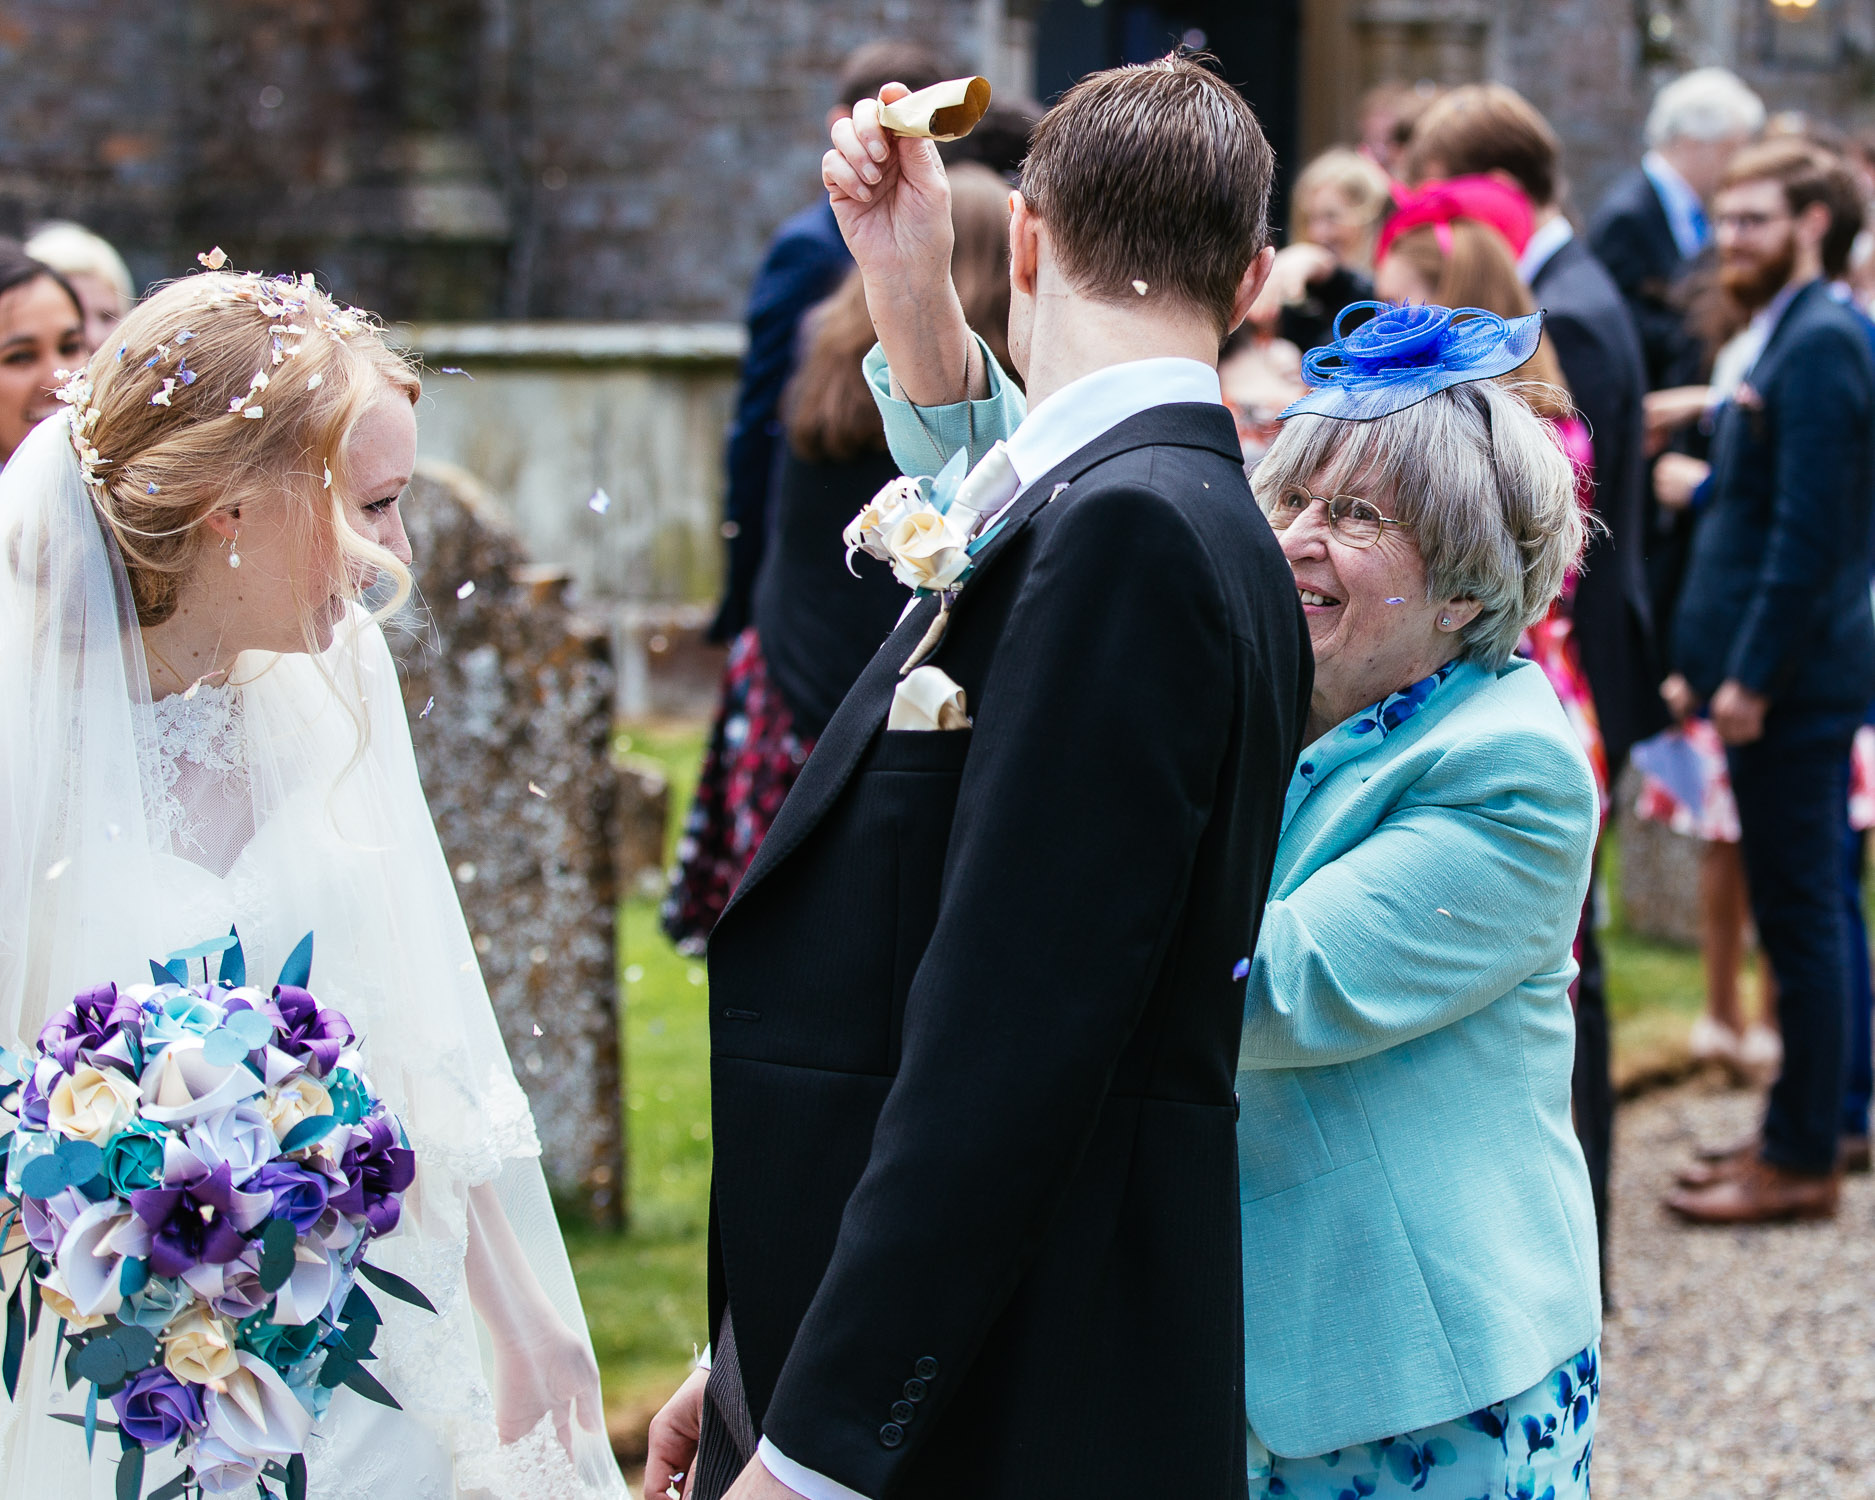 Lizi-and-Mark-Wedding-Highlights-39.jpg